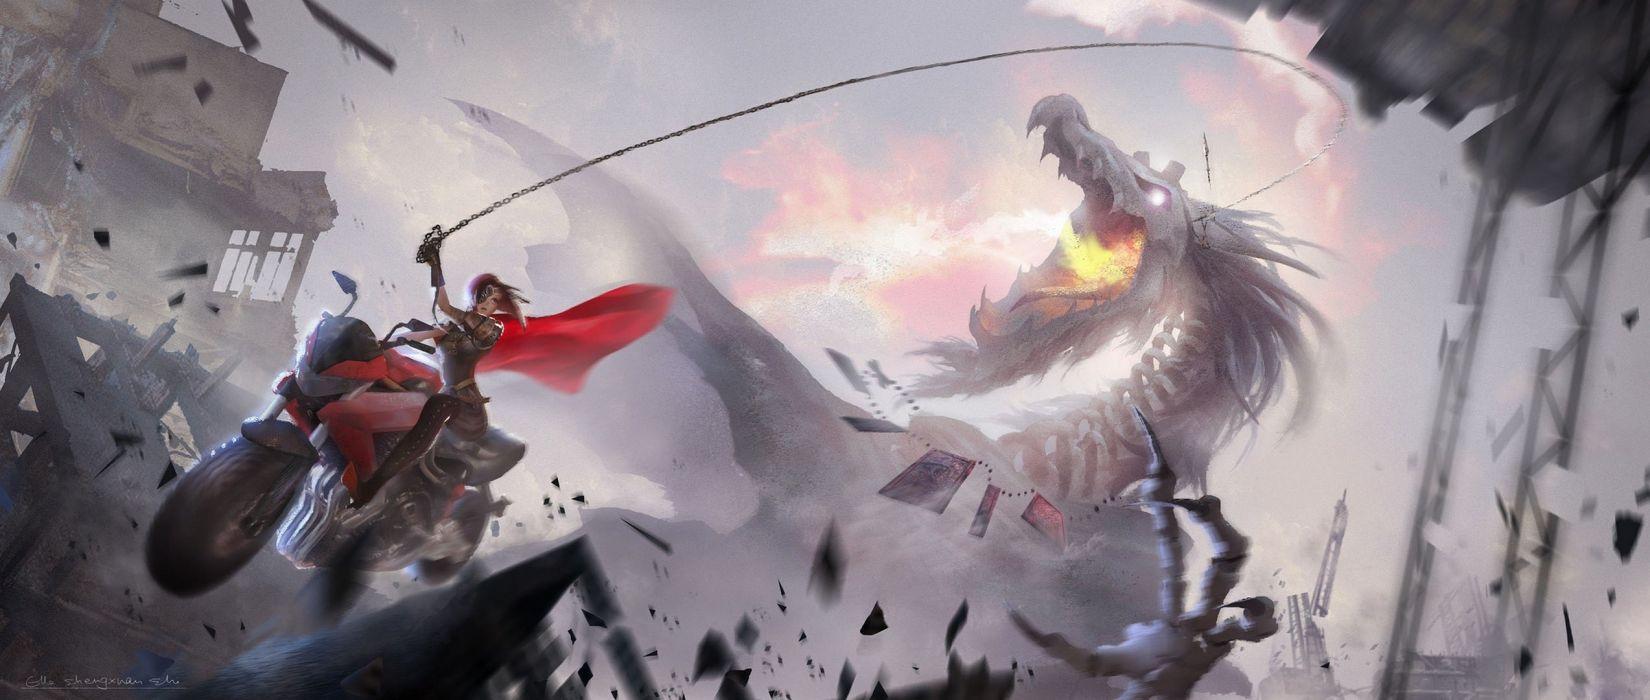 fantasy girl beauty beautiful long hair woman warrior dragon wallpaper